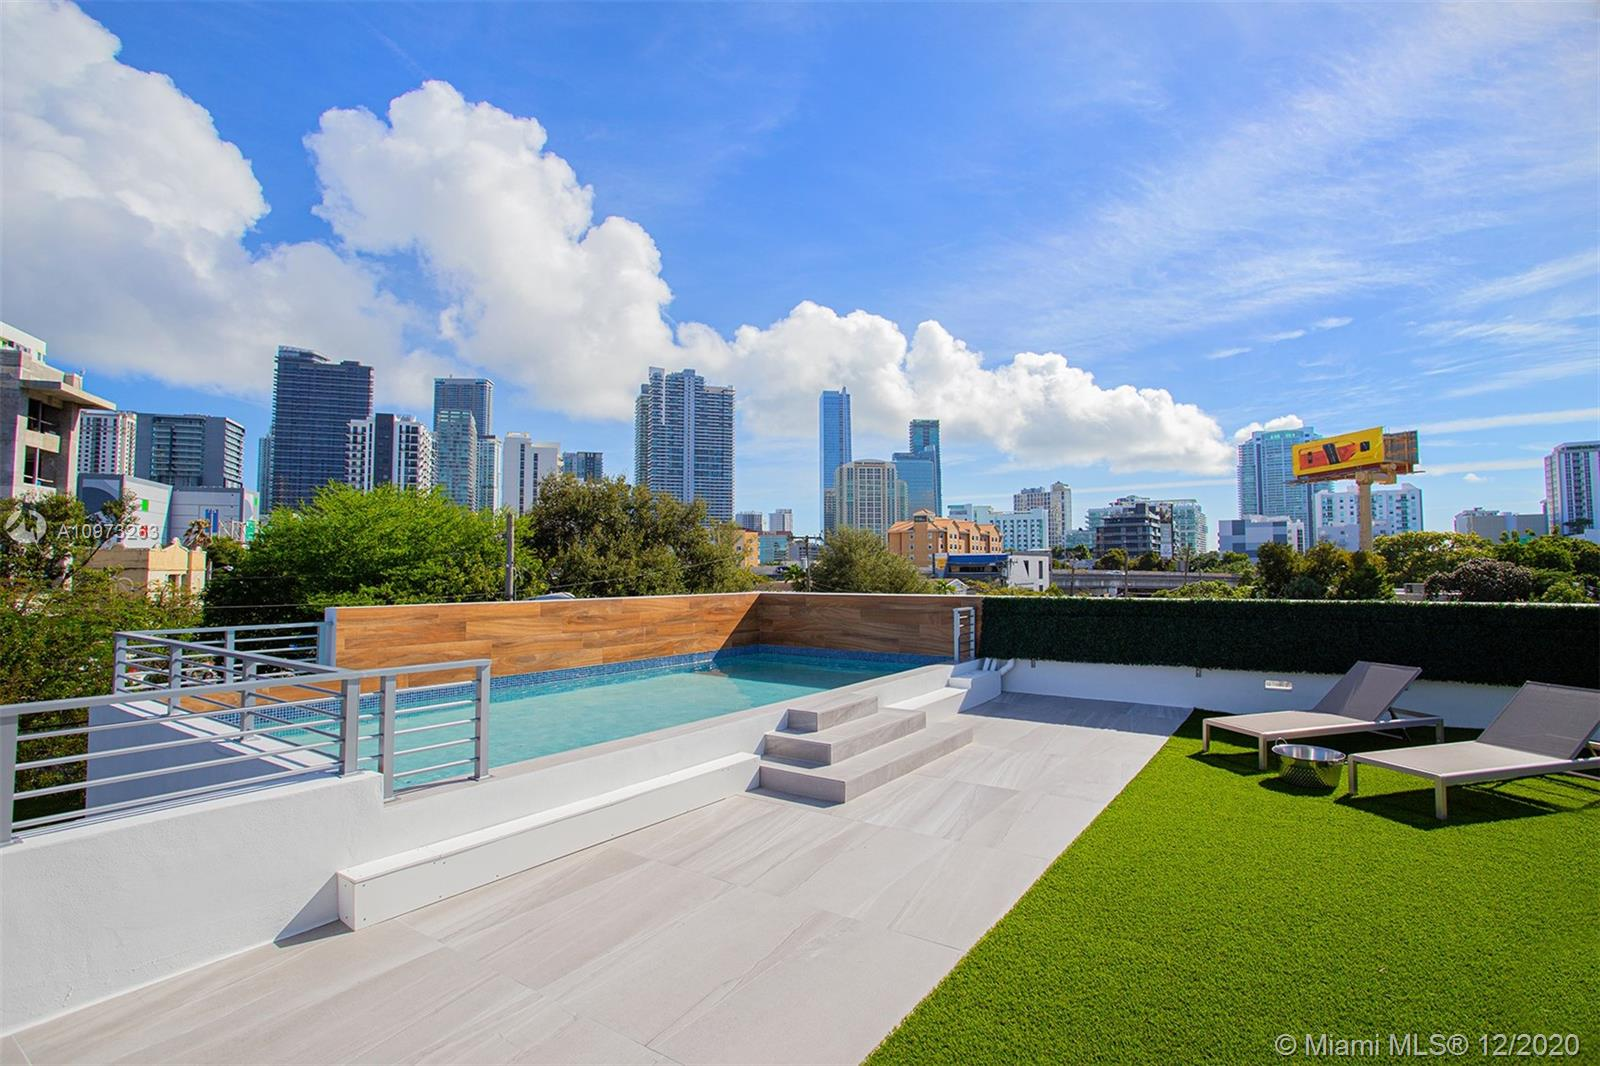 Holleman Park - 1701 SW 4th Ave, Miami, FL 33129